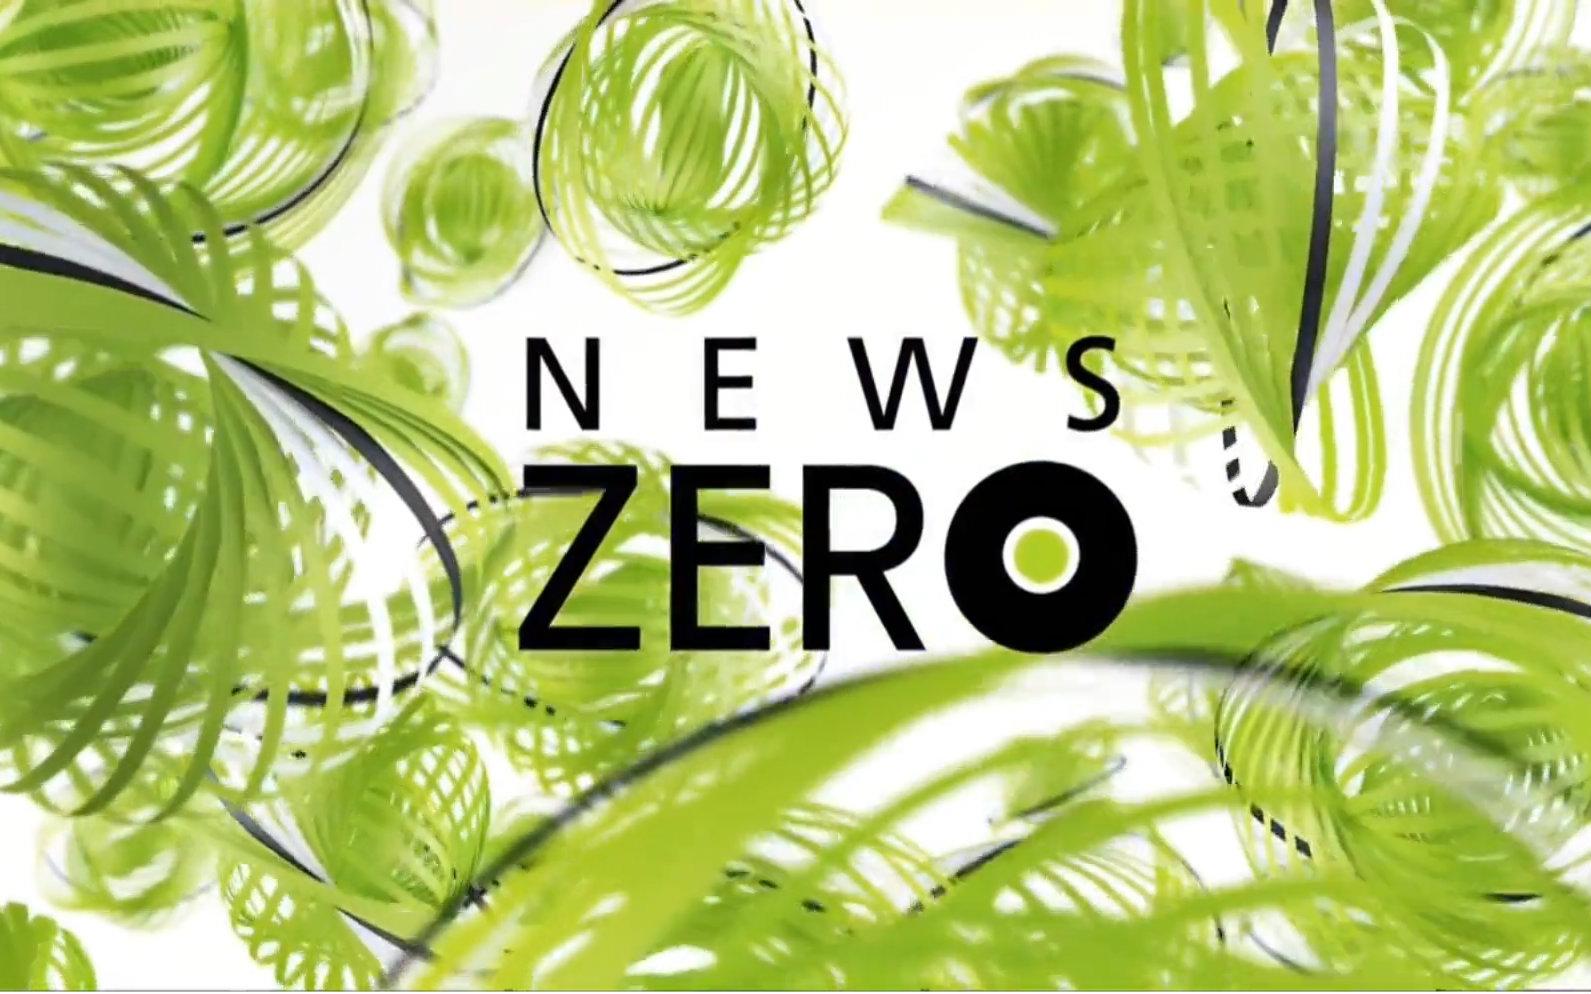 http://image.sike.news.cn/uploads/2016/01/1453350692-8376.jpeg_06.20]【樱井翔】news zero(剪辑版)